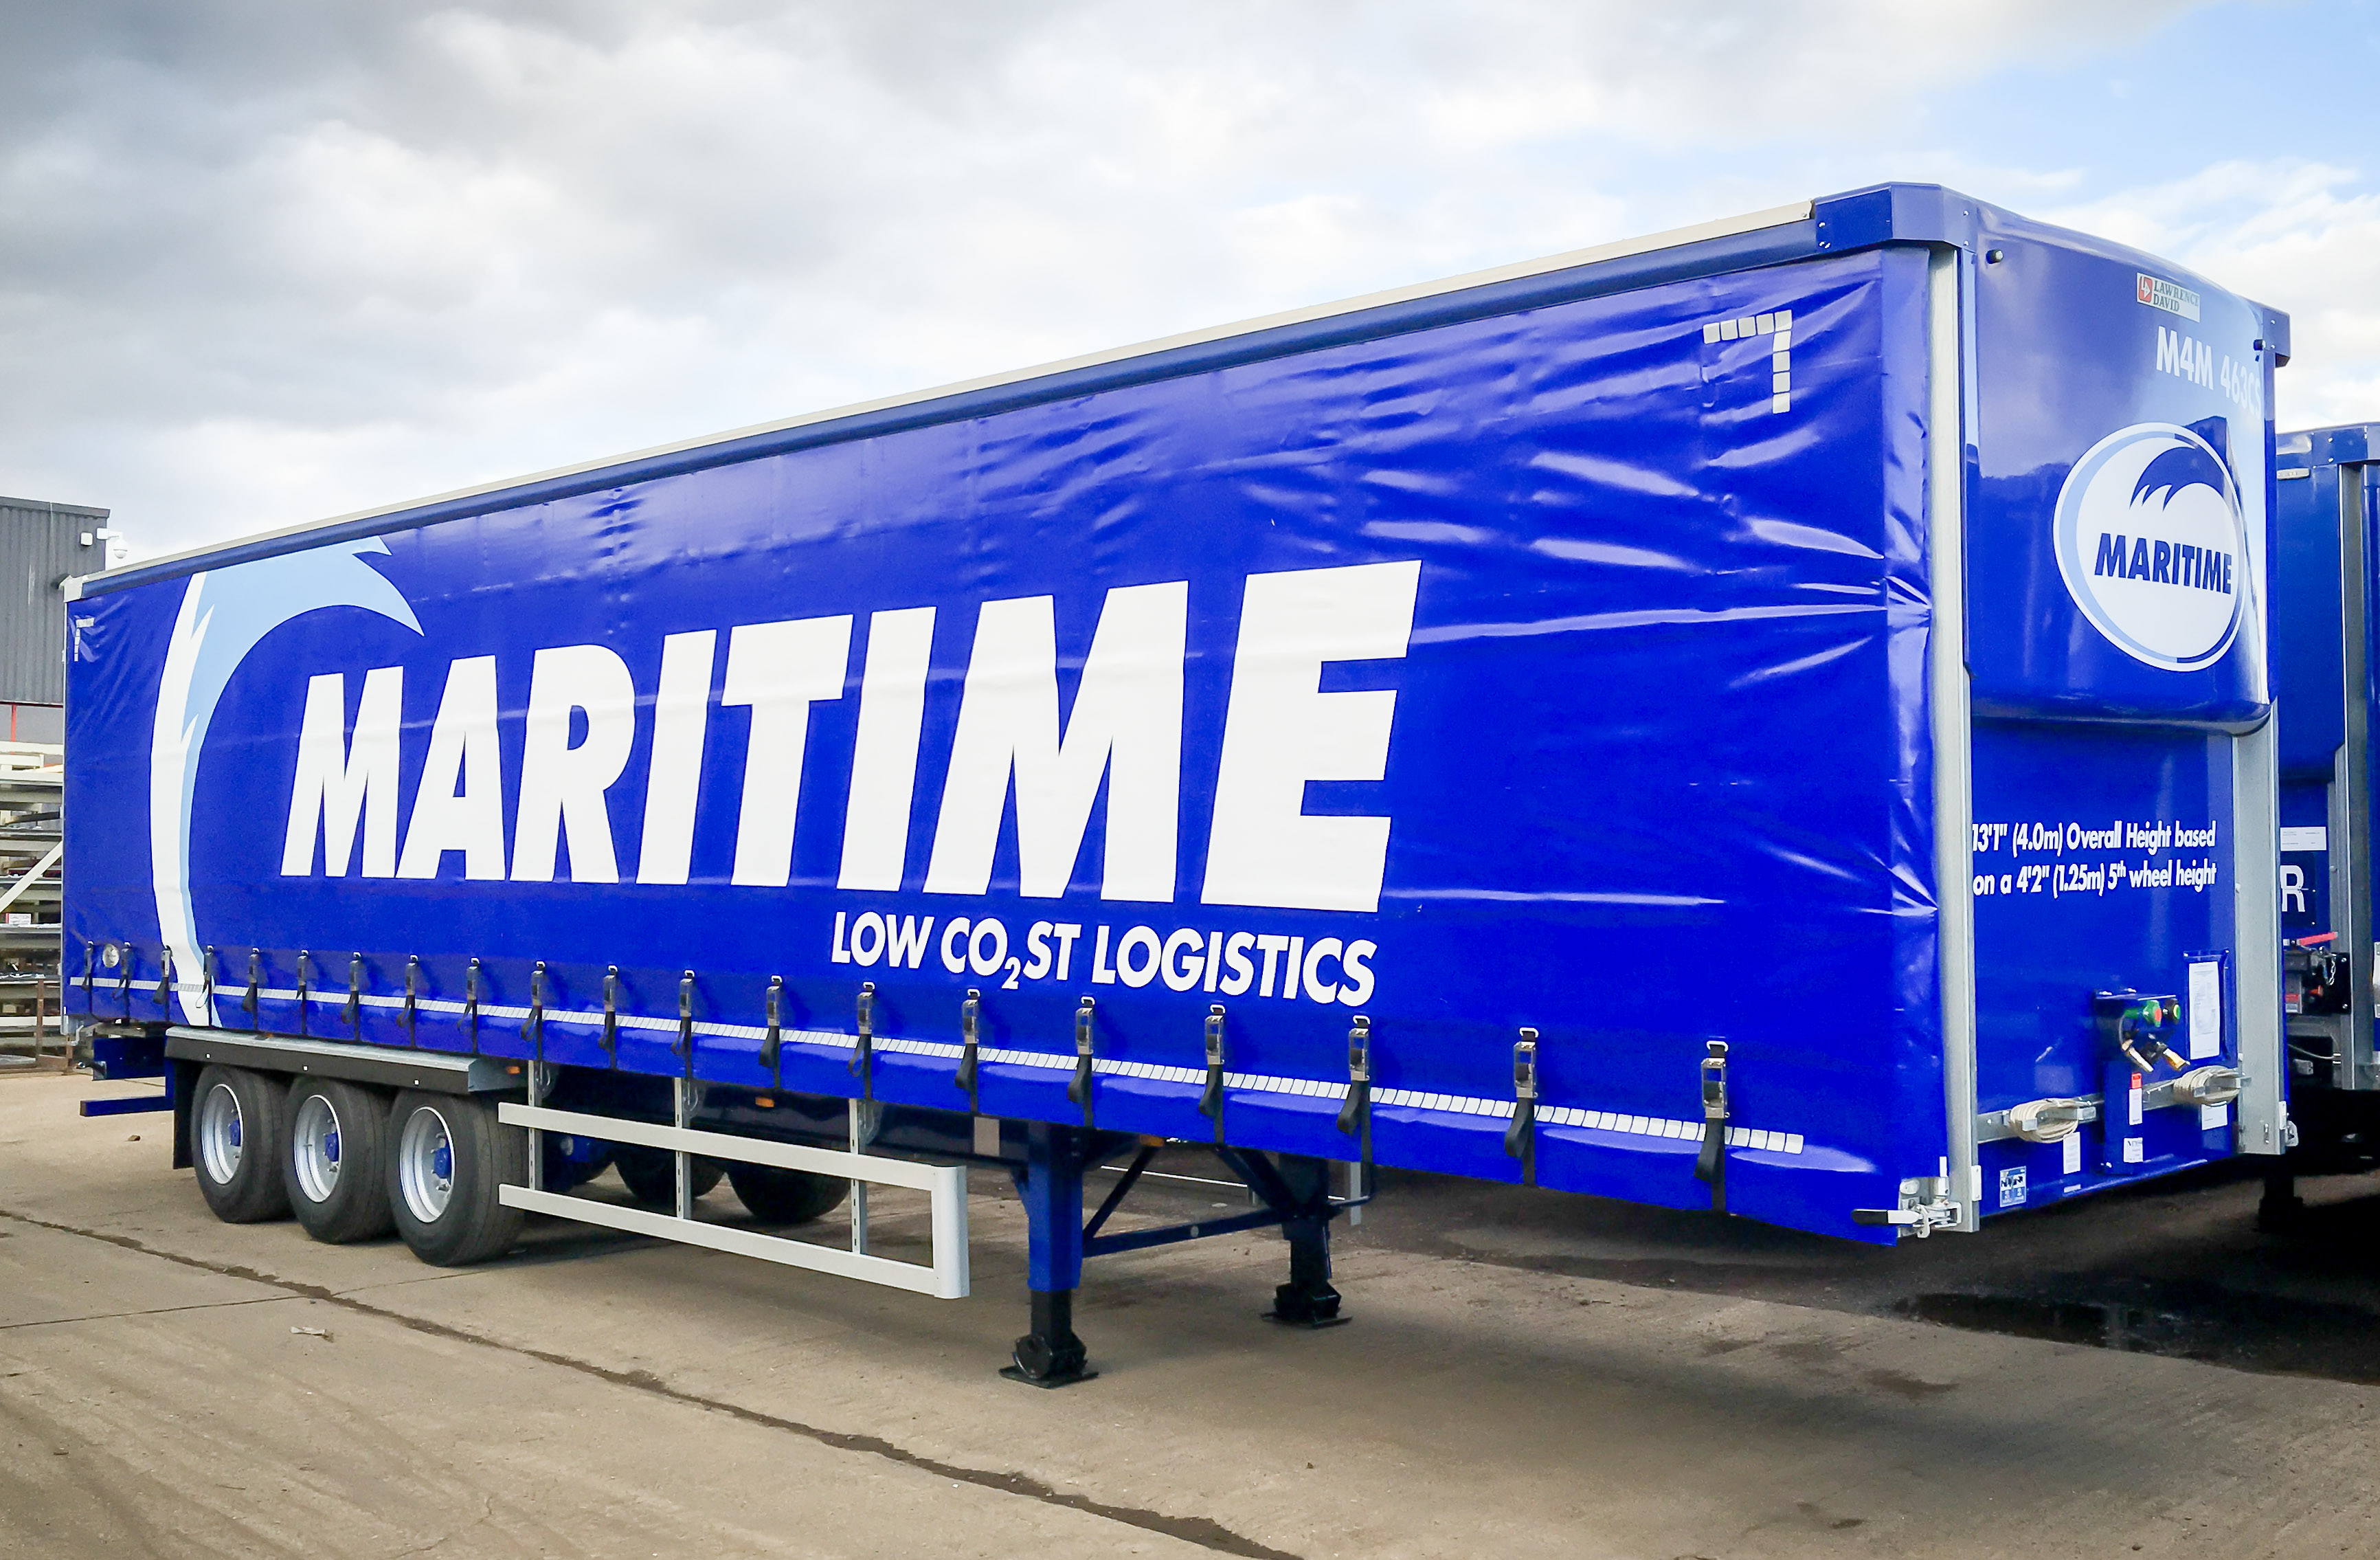 Maritime Logistics by InfiniShield